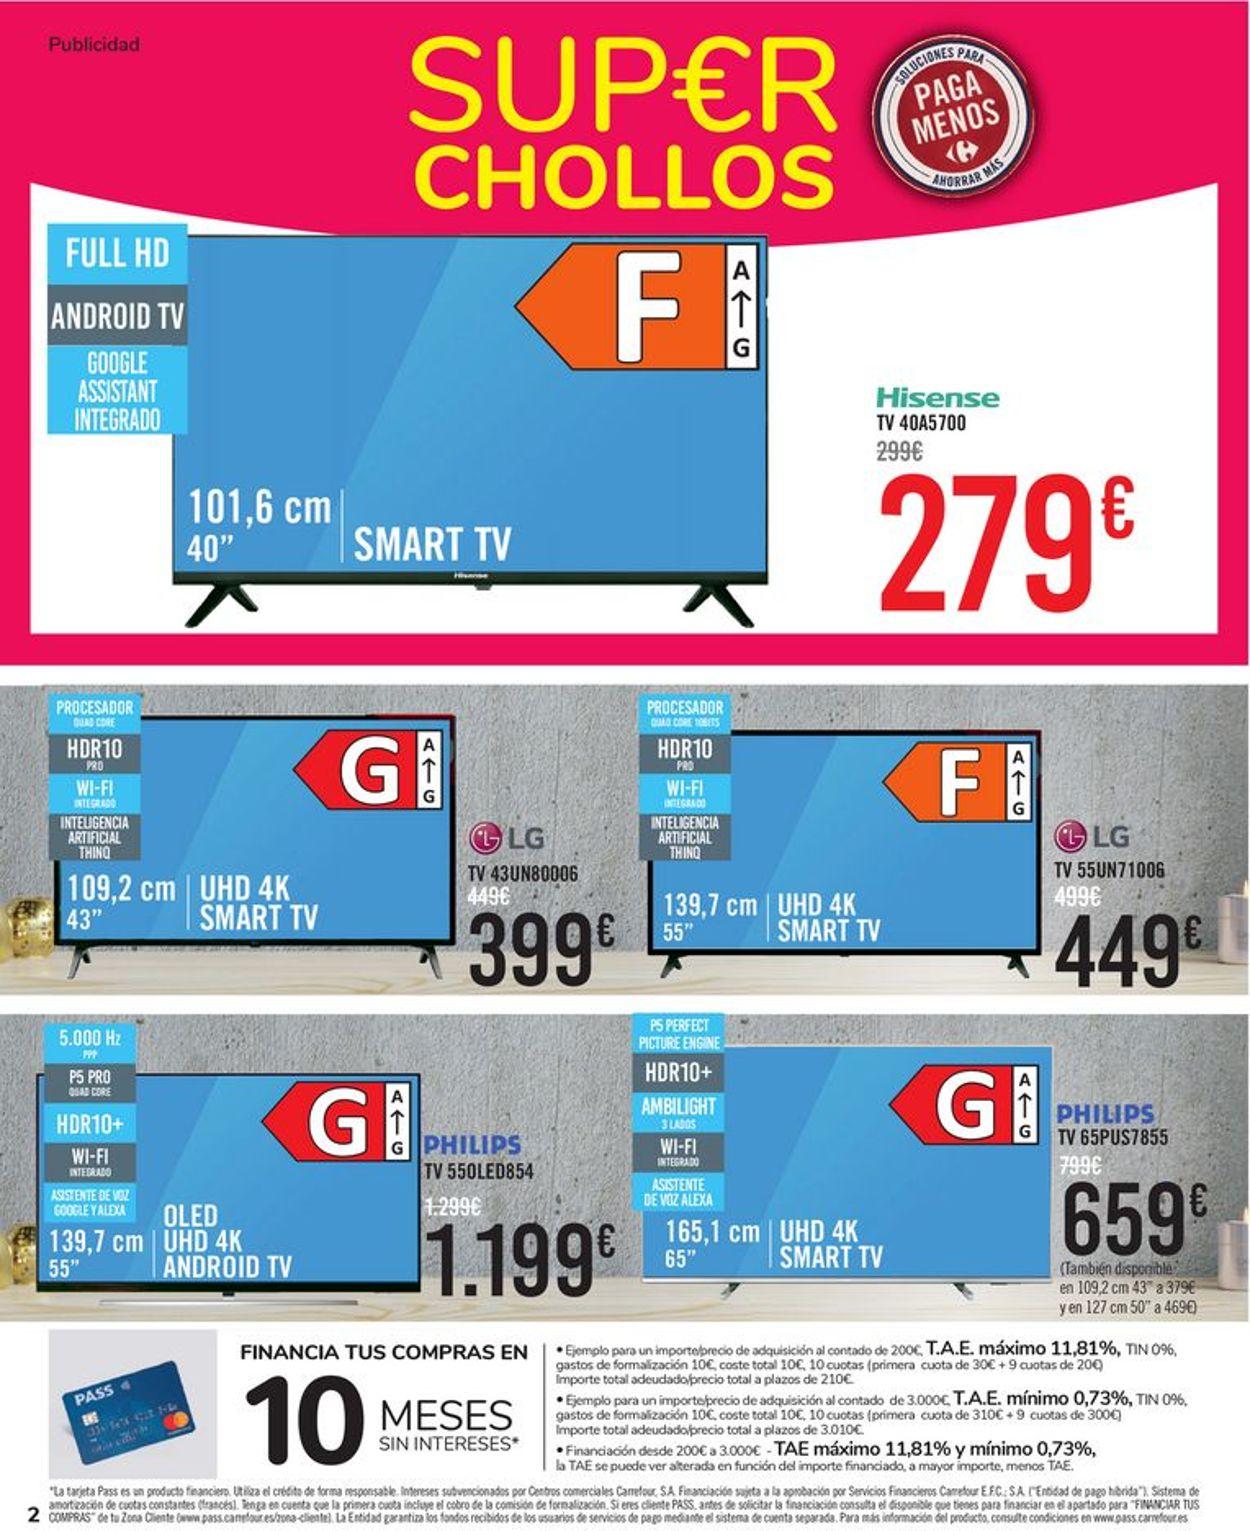 Carrefour Super Chollos Folleto - 16.04-26.04.2021 (Página 2)